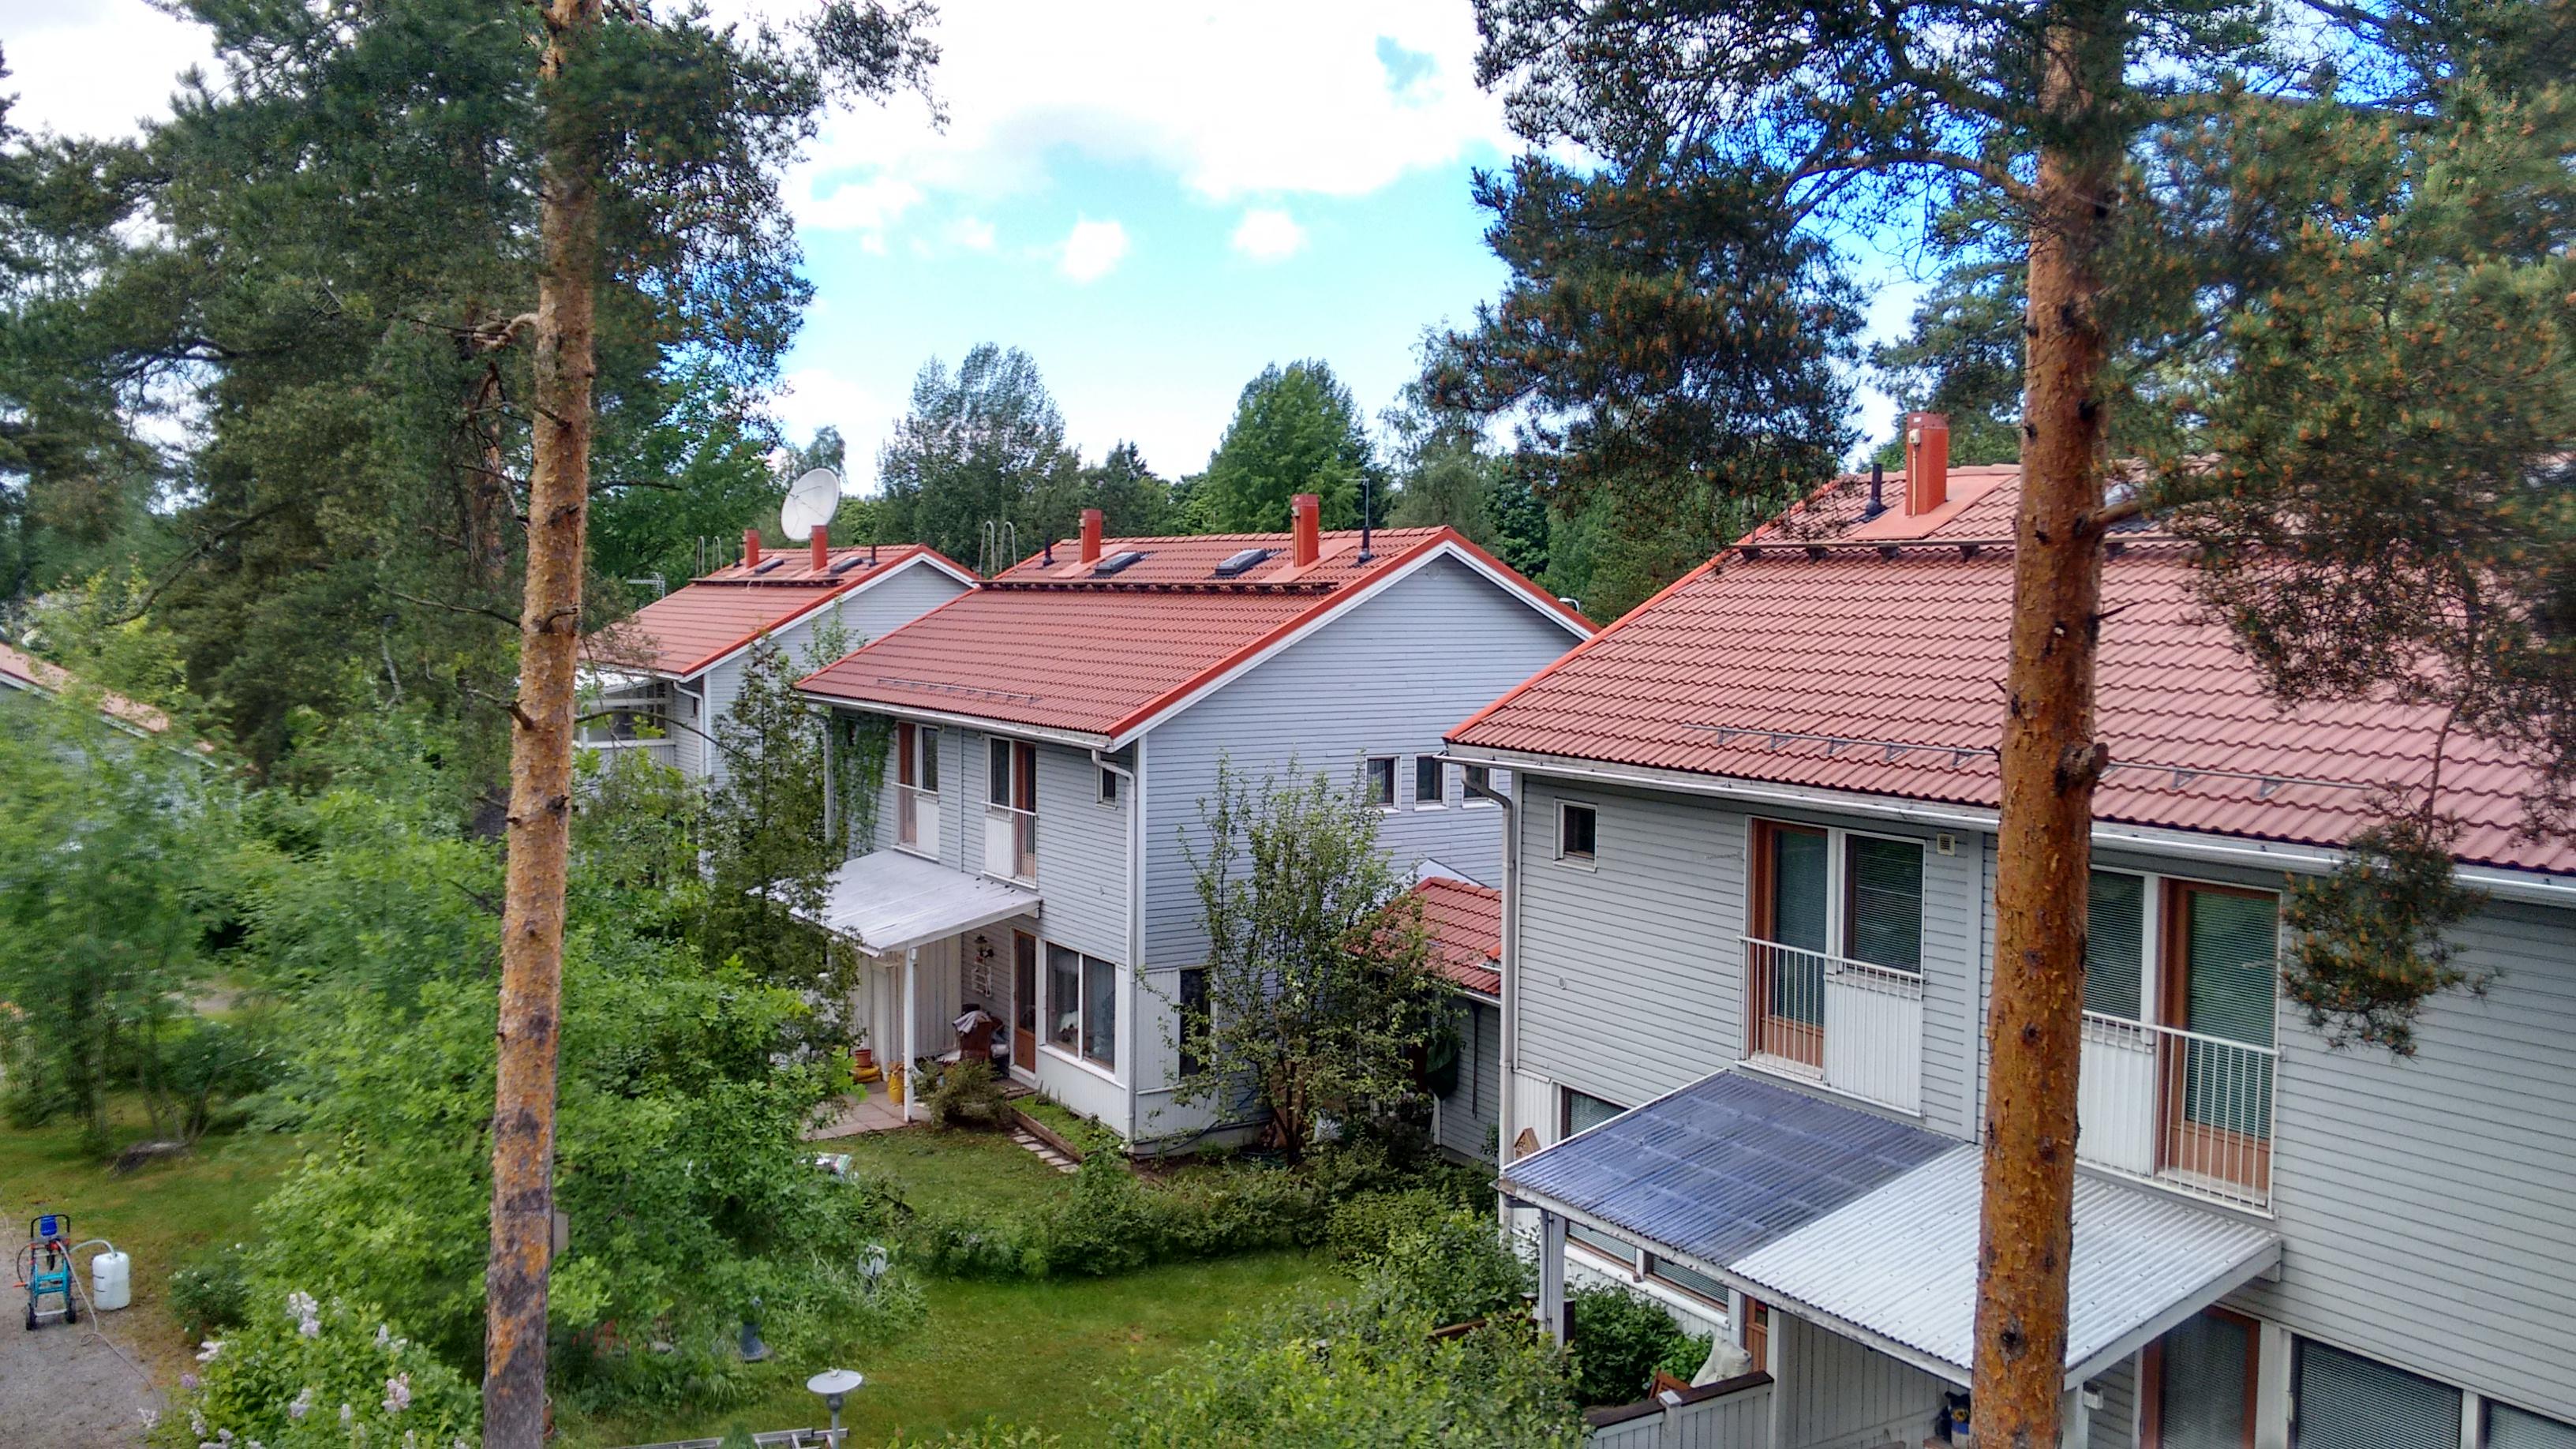 Tiilikattohuolto helsinki 1000 m2 referenssit for Gartengestaltung 1000 m2